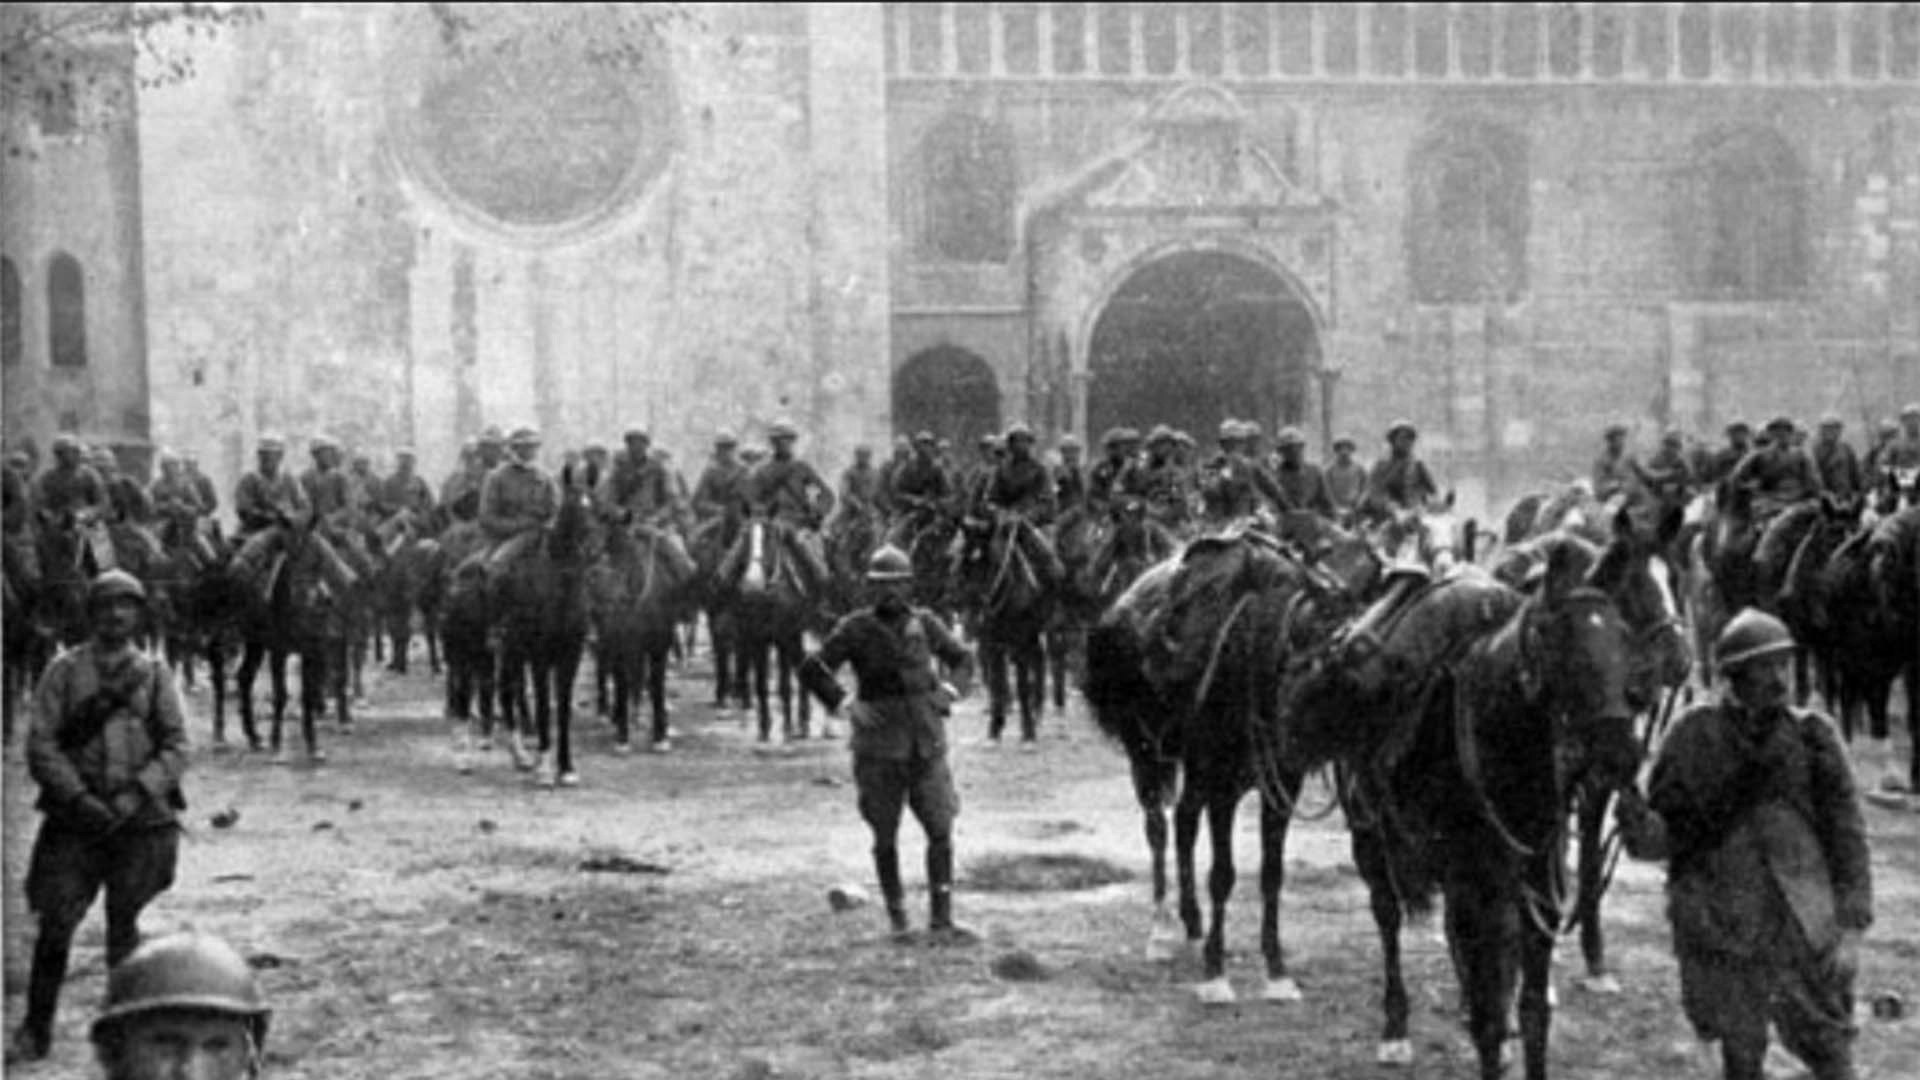 Grande Guerra. Quei soldati fucilati rimasti senza giustizia